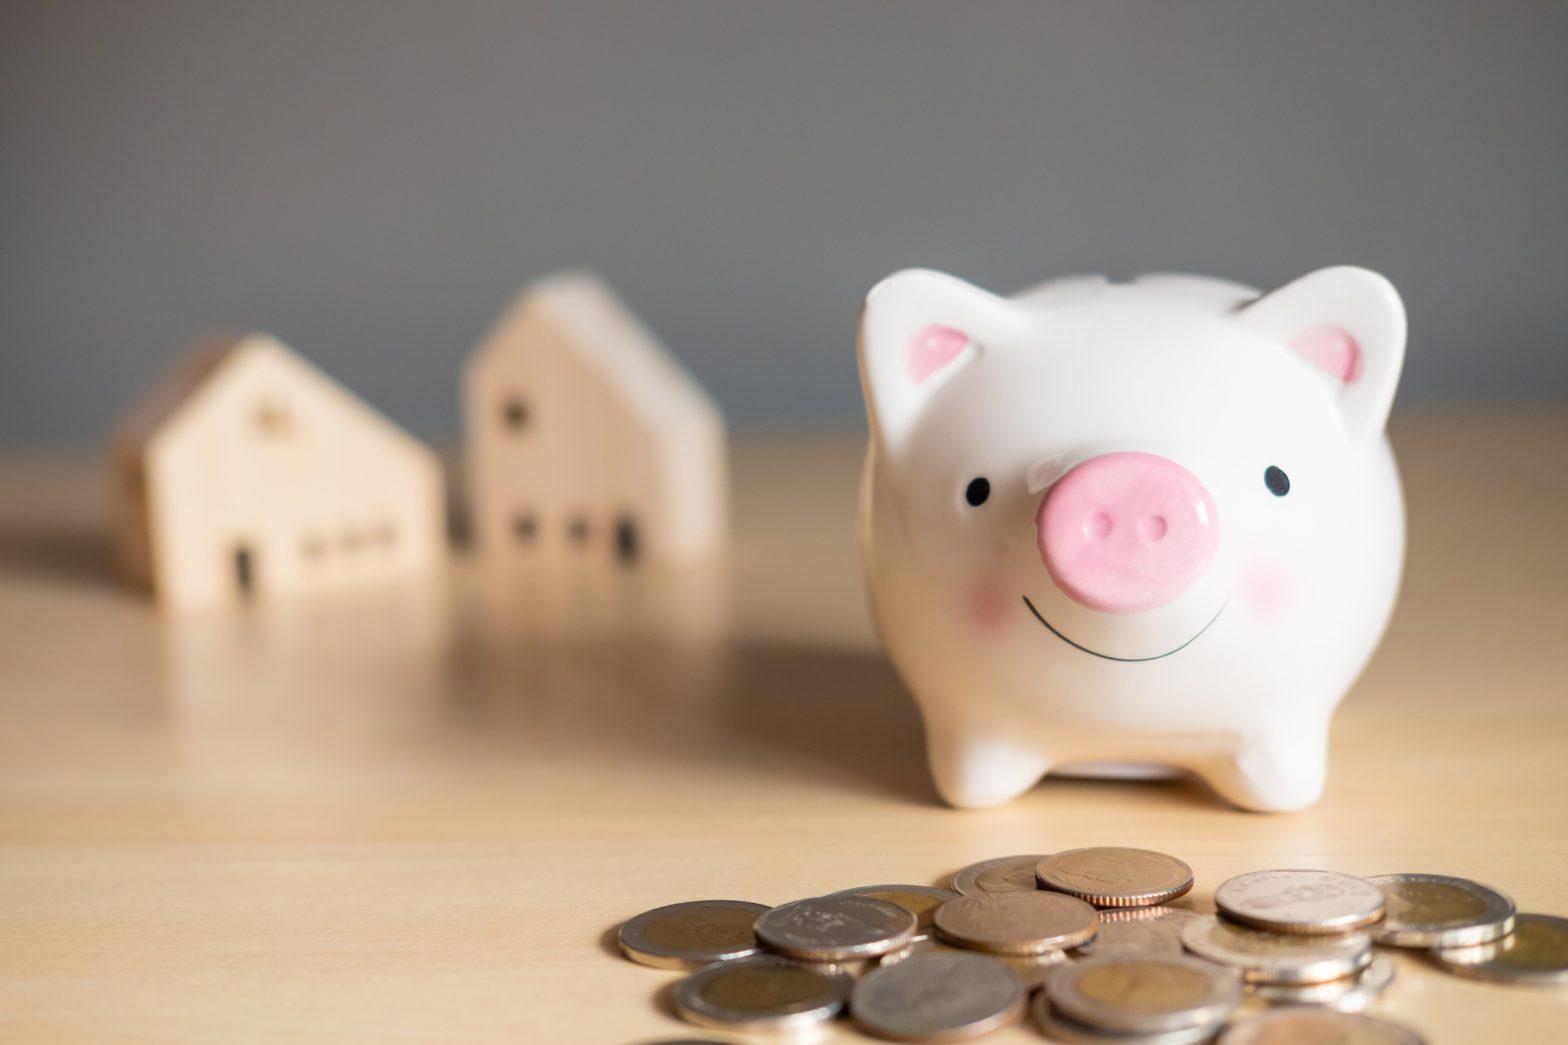 Refinansiering for vanskeligstilte